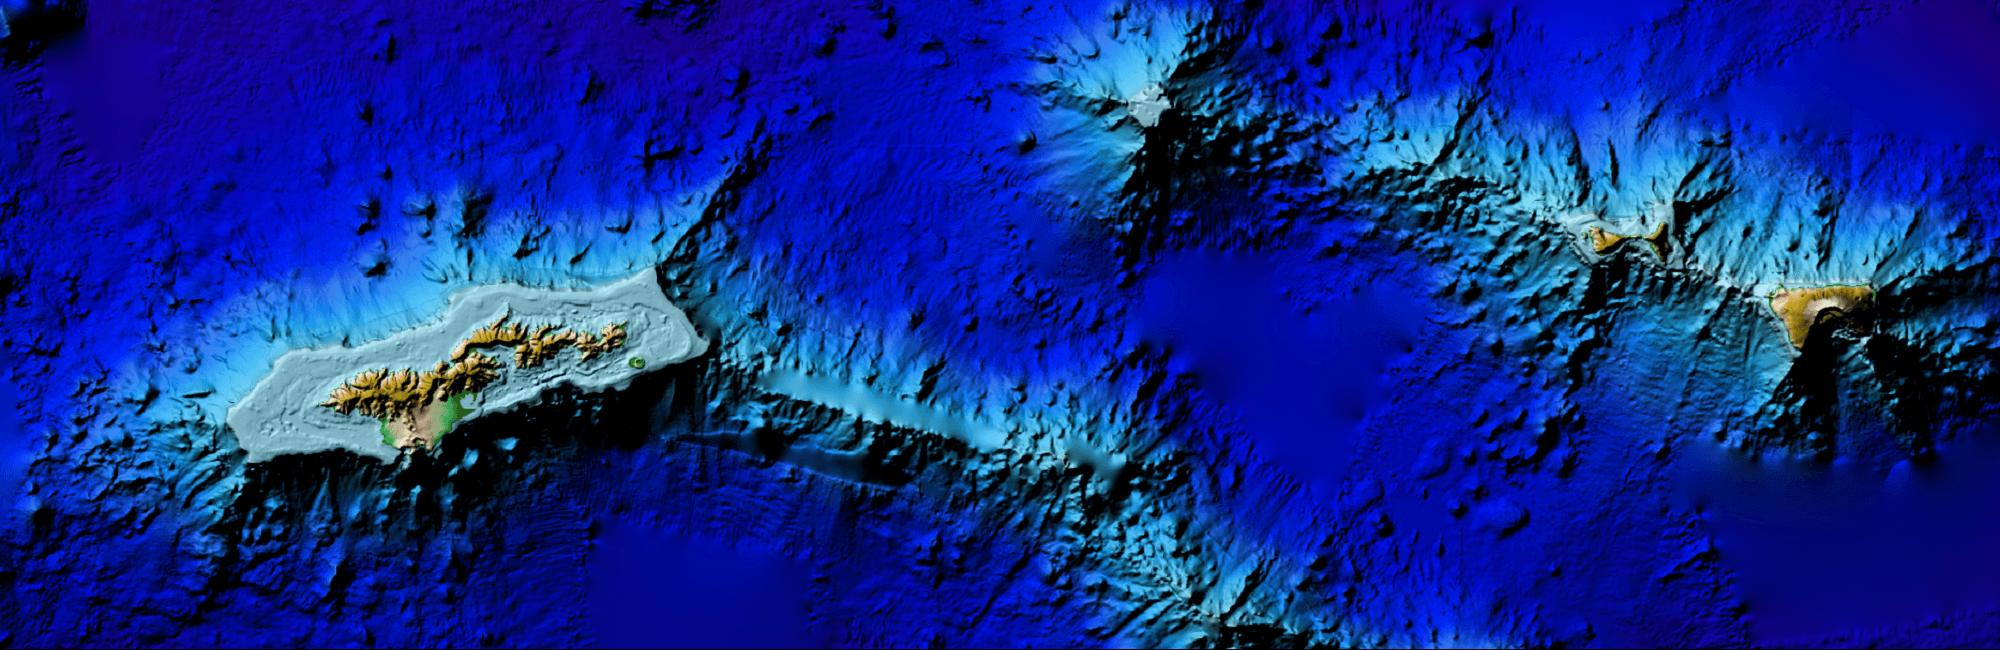 Digital elevation map of American Samoa